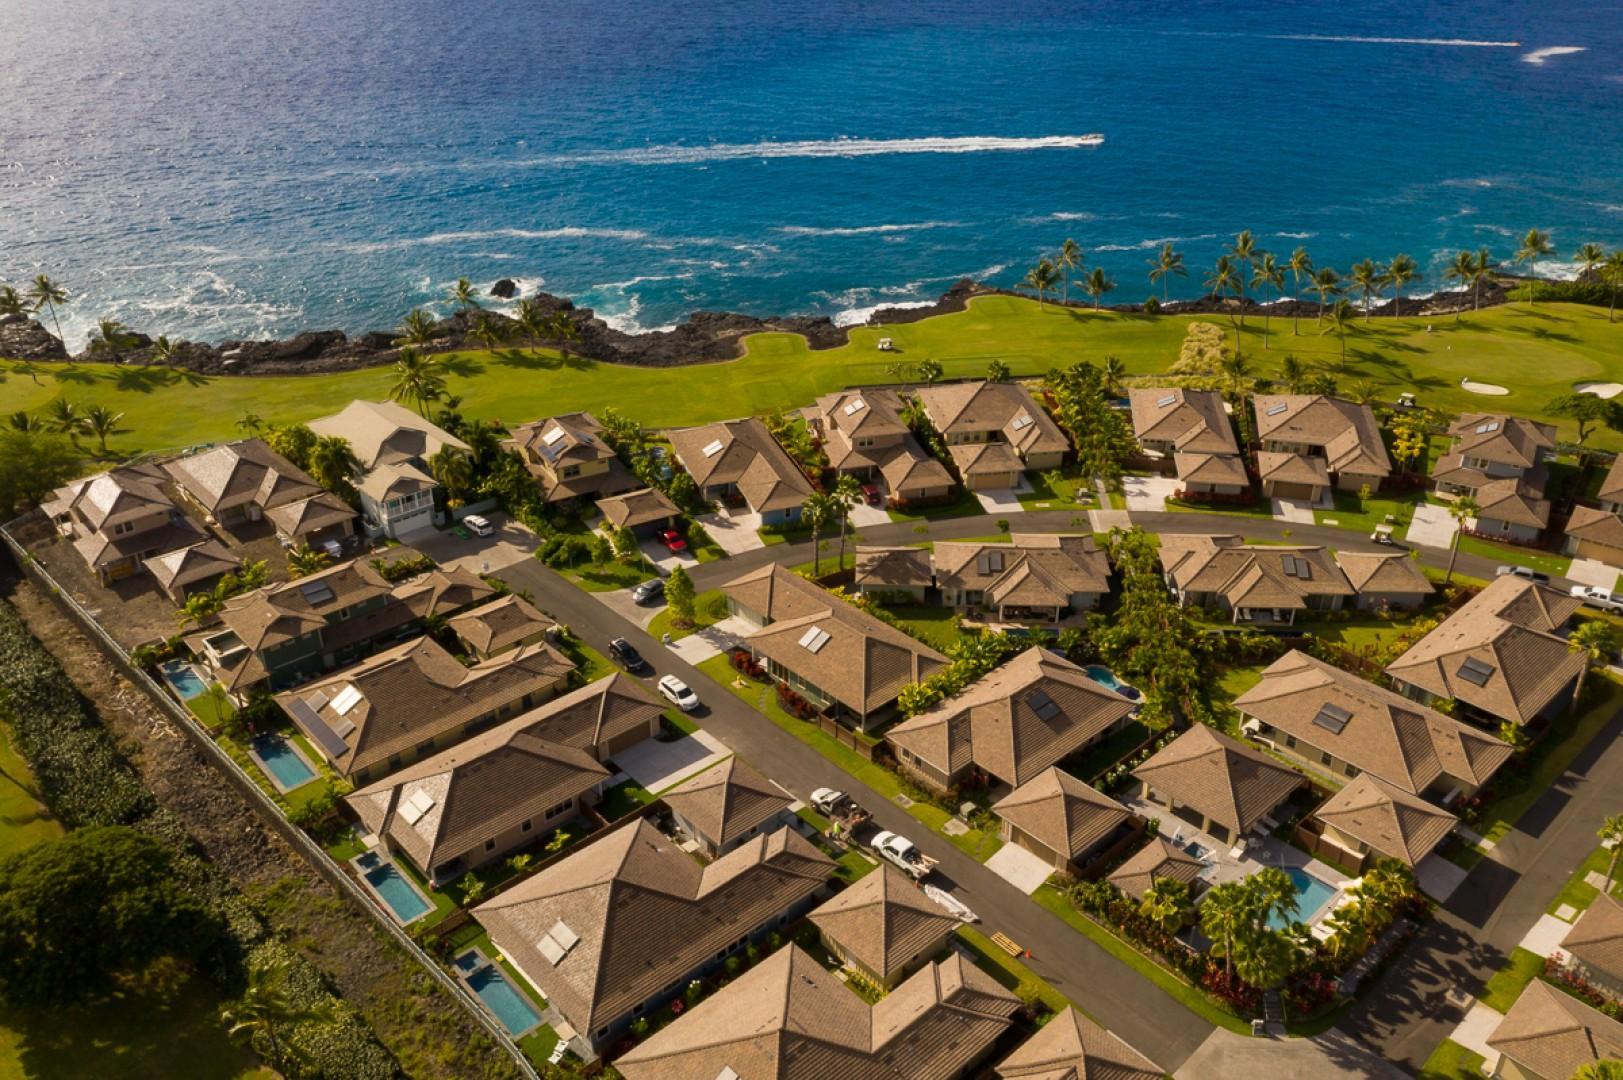 Holua Kai community